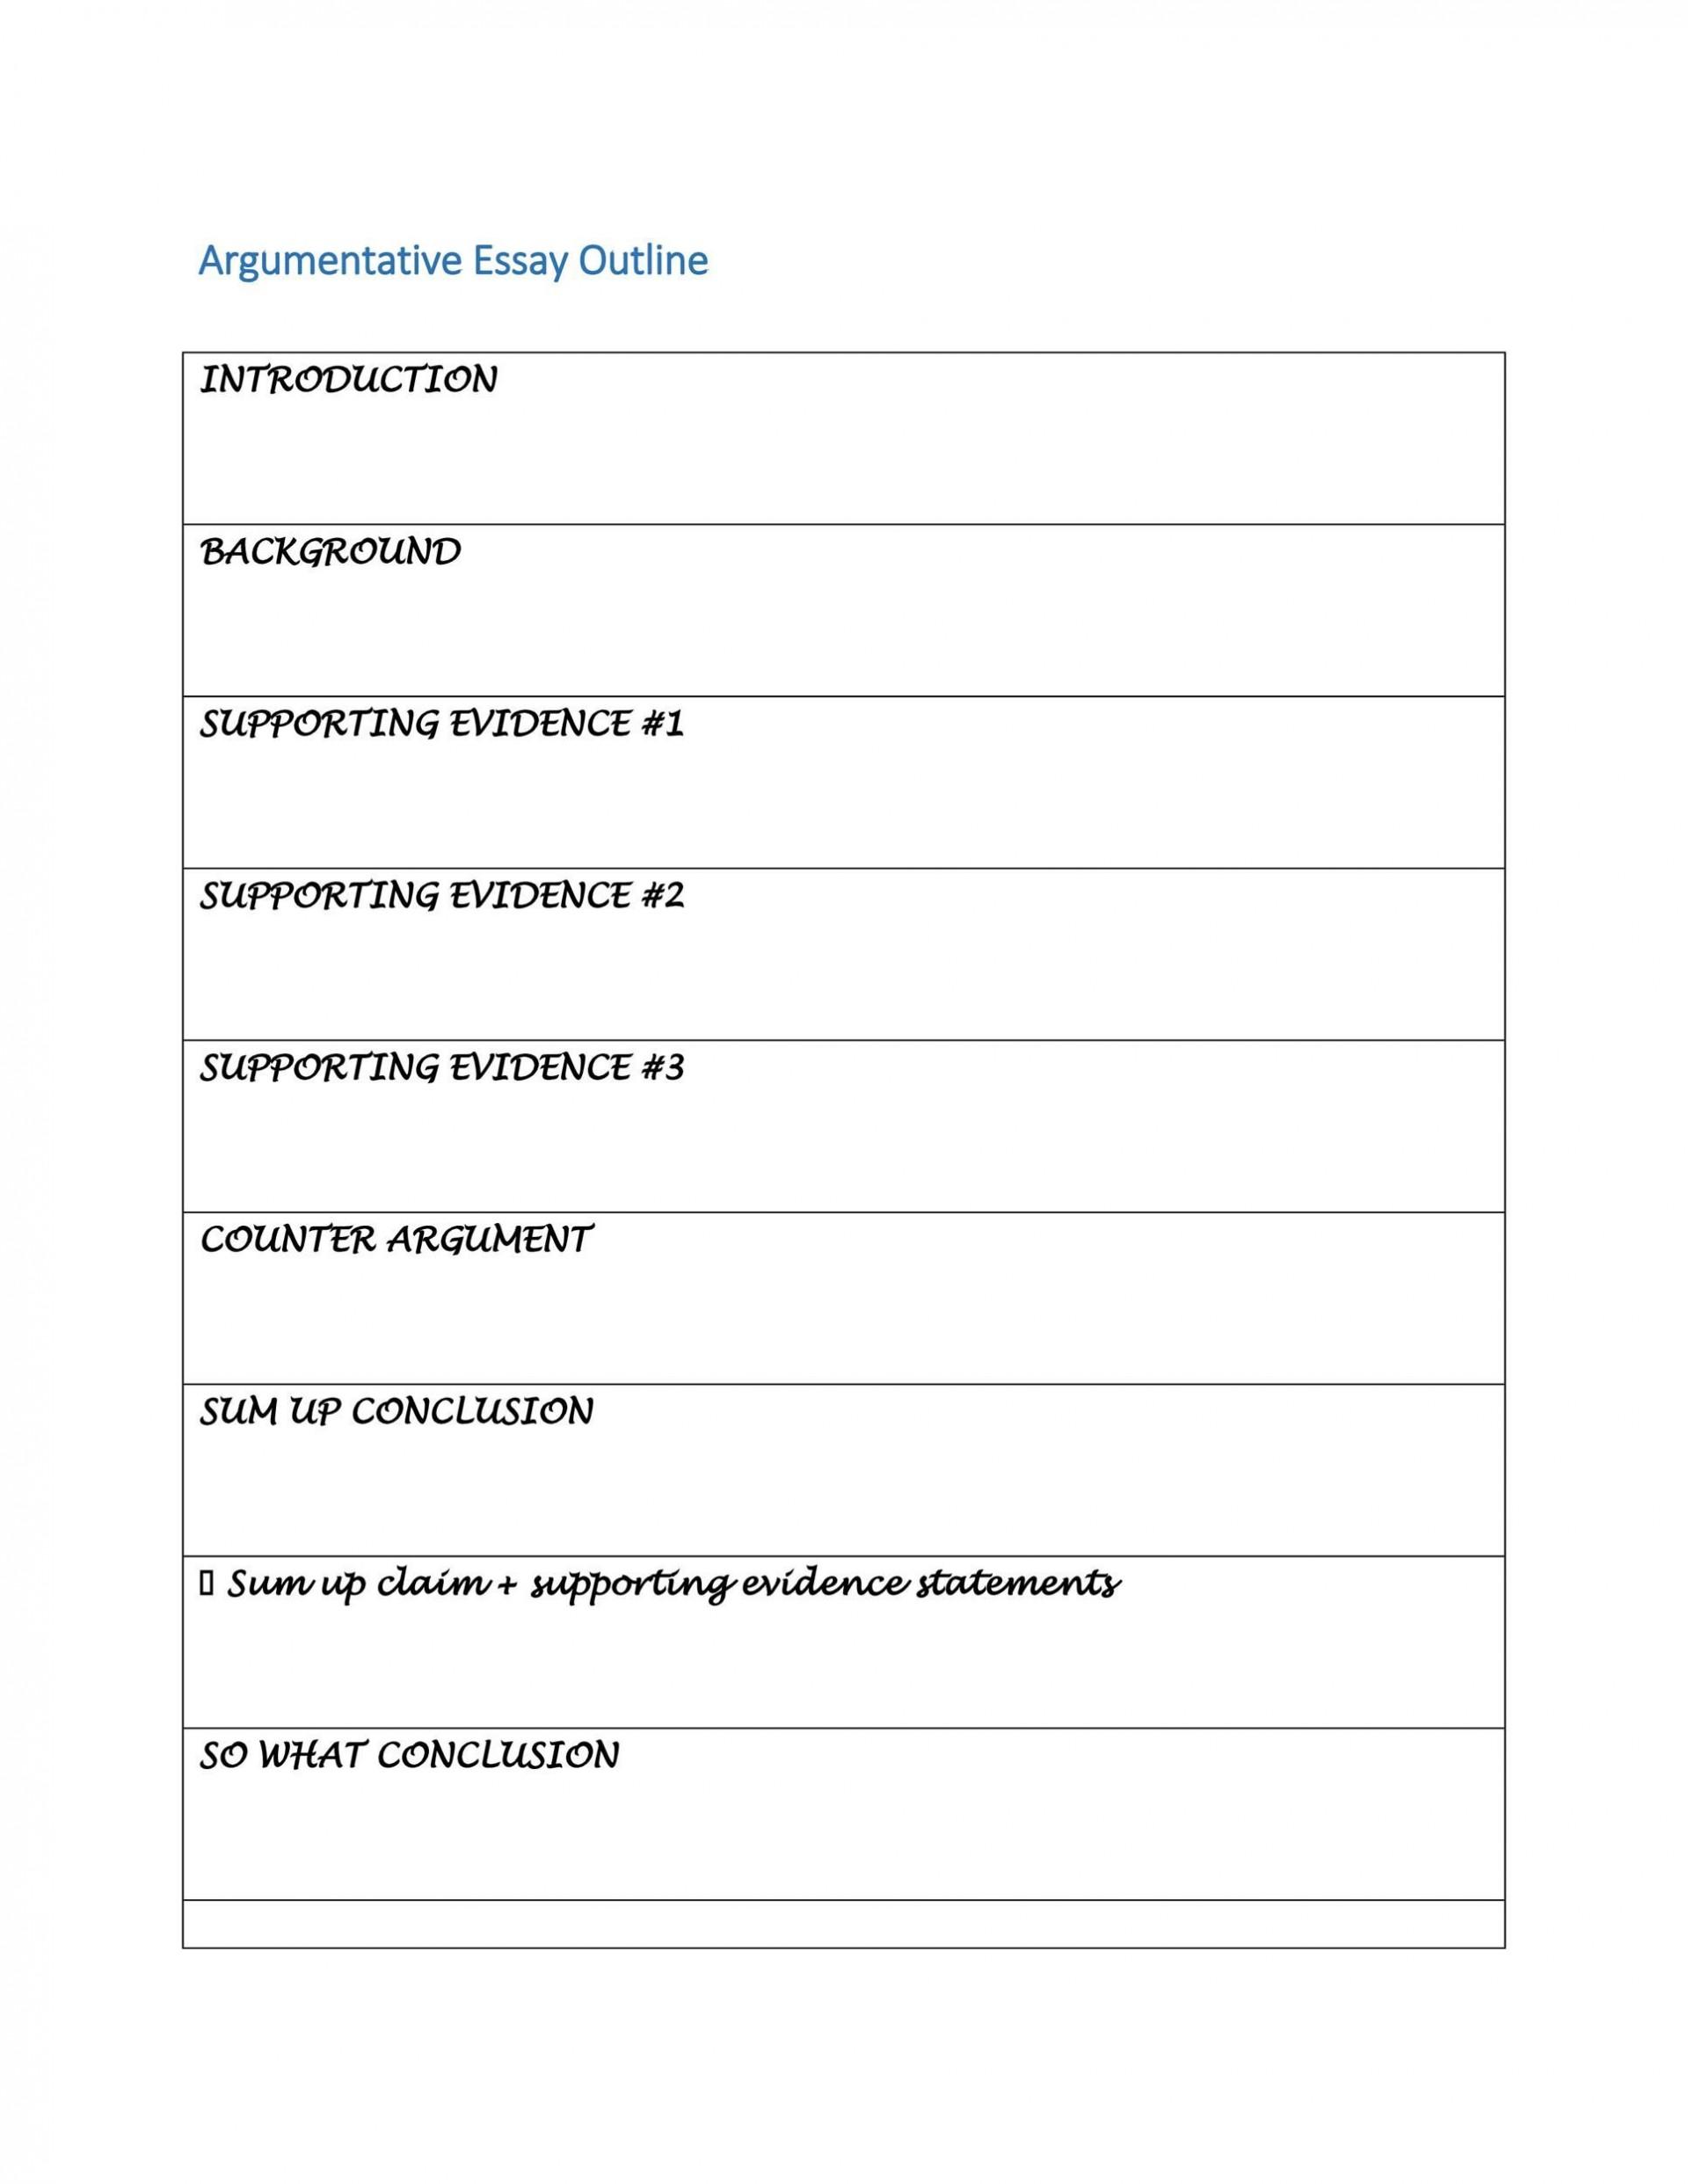 007 Dreaded Argumentative Essay Outline Template Inspiration  Mla Format Doc Middle School1920